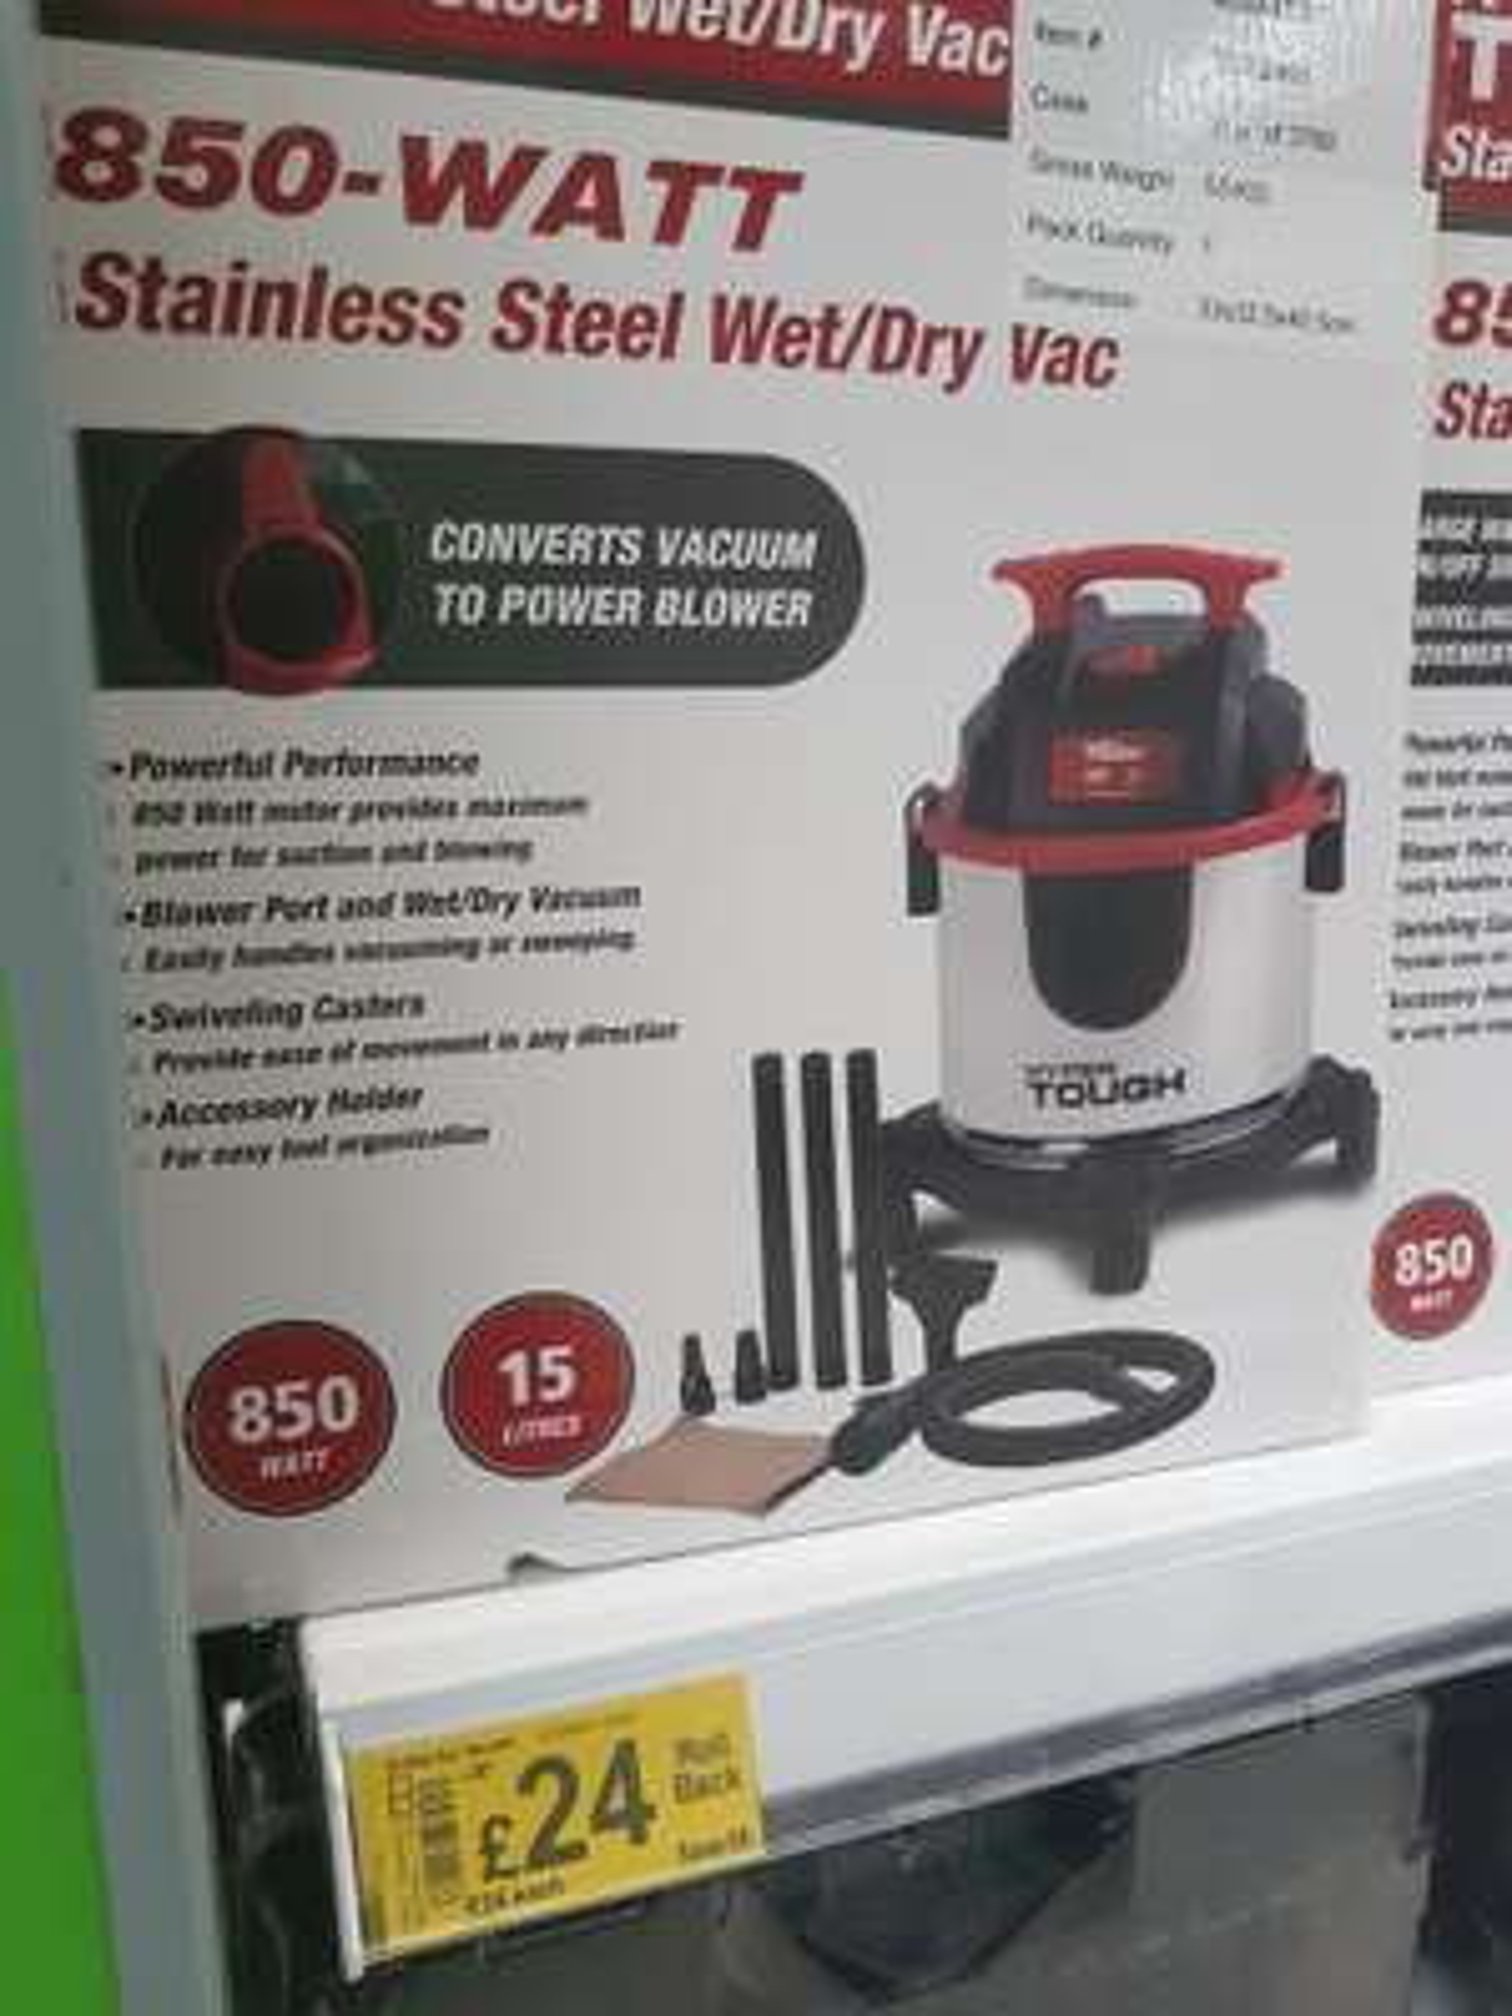 Hyper Tough 850-Watt Stainless Steel Wet / Dry Vac £24 instore @ Asda